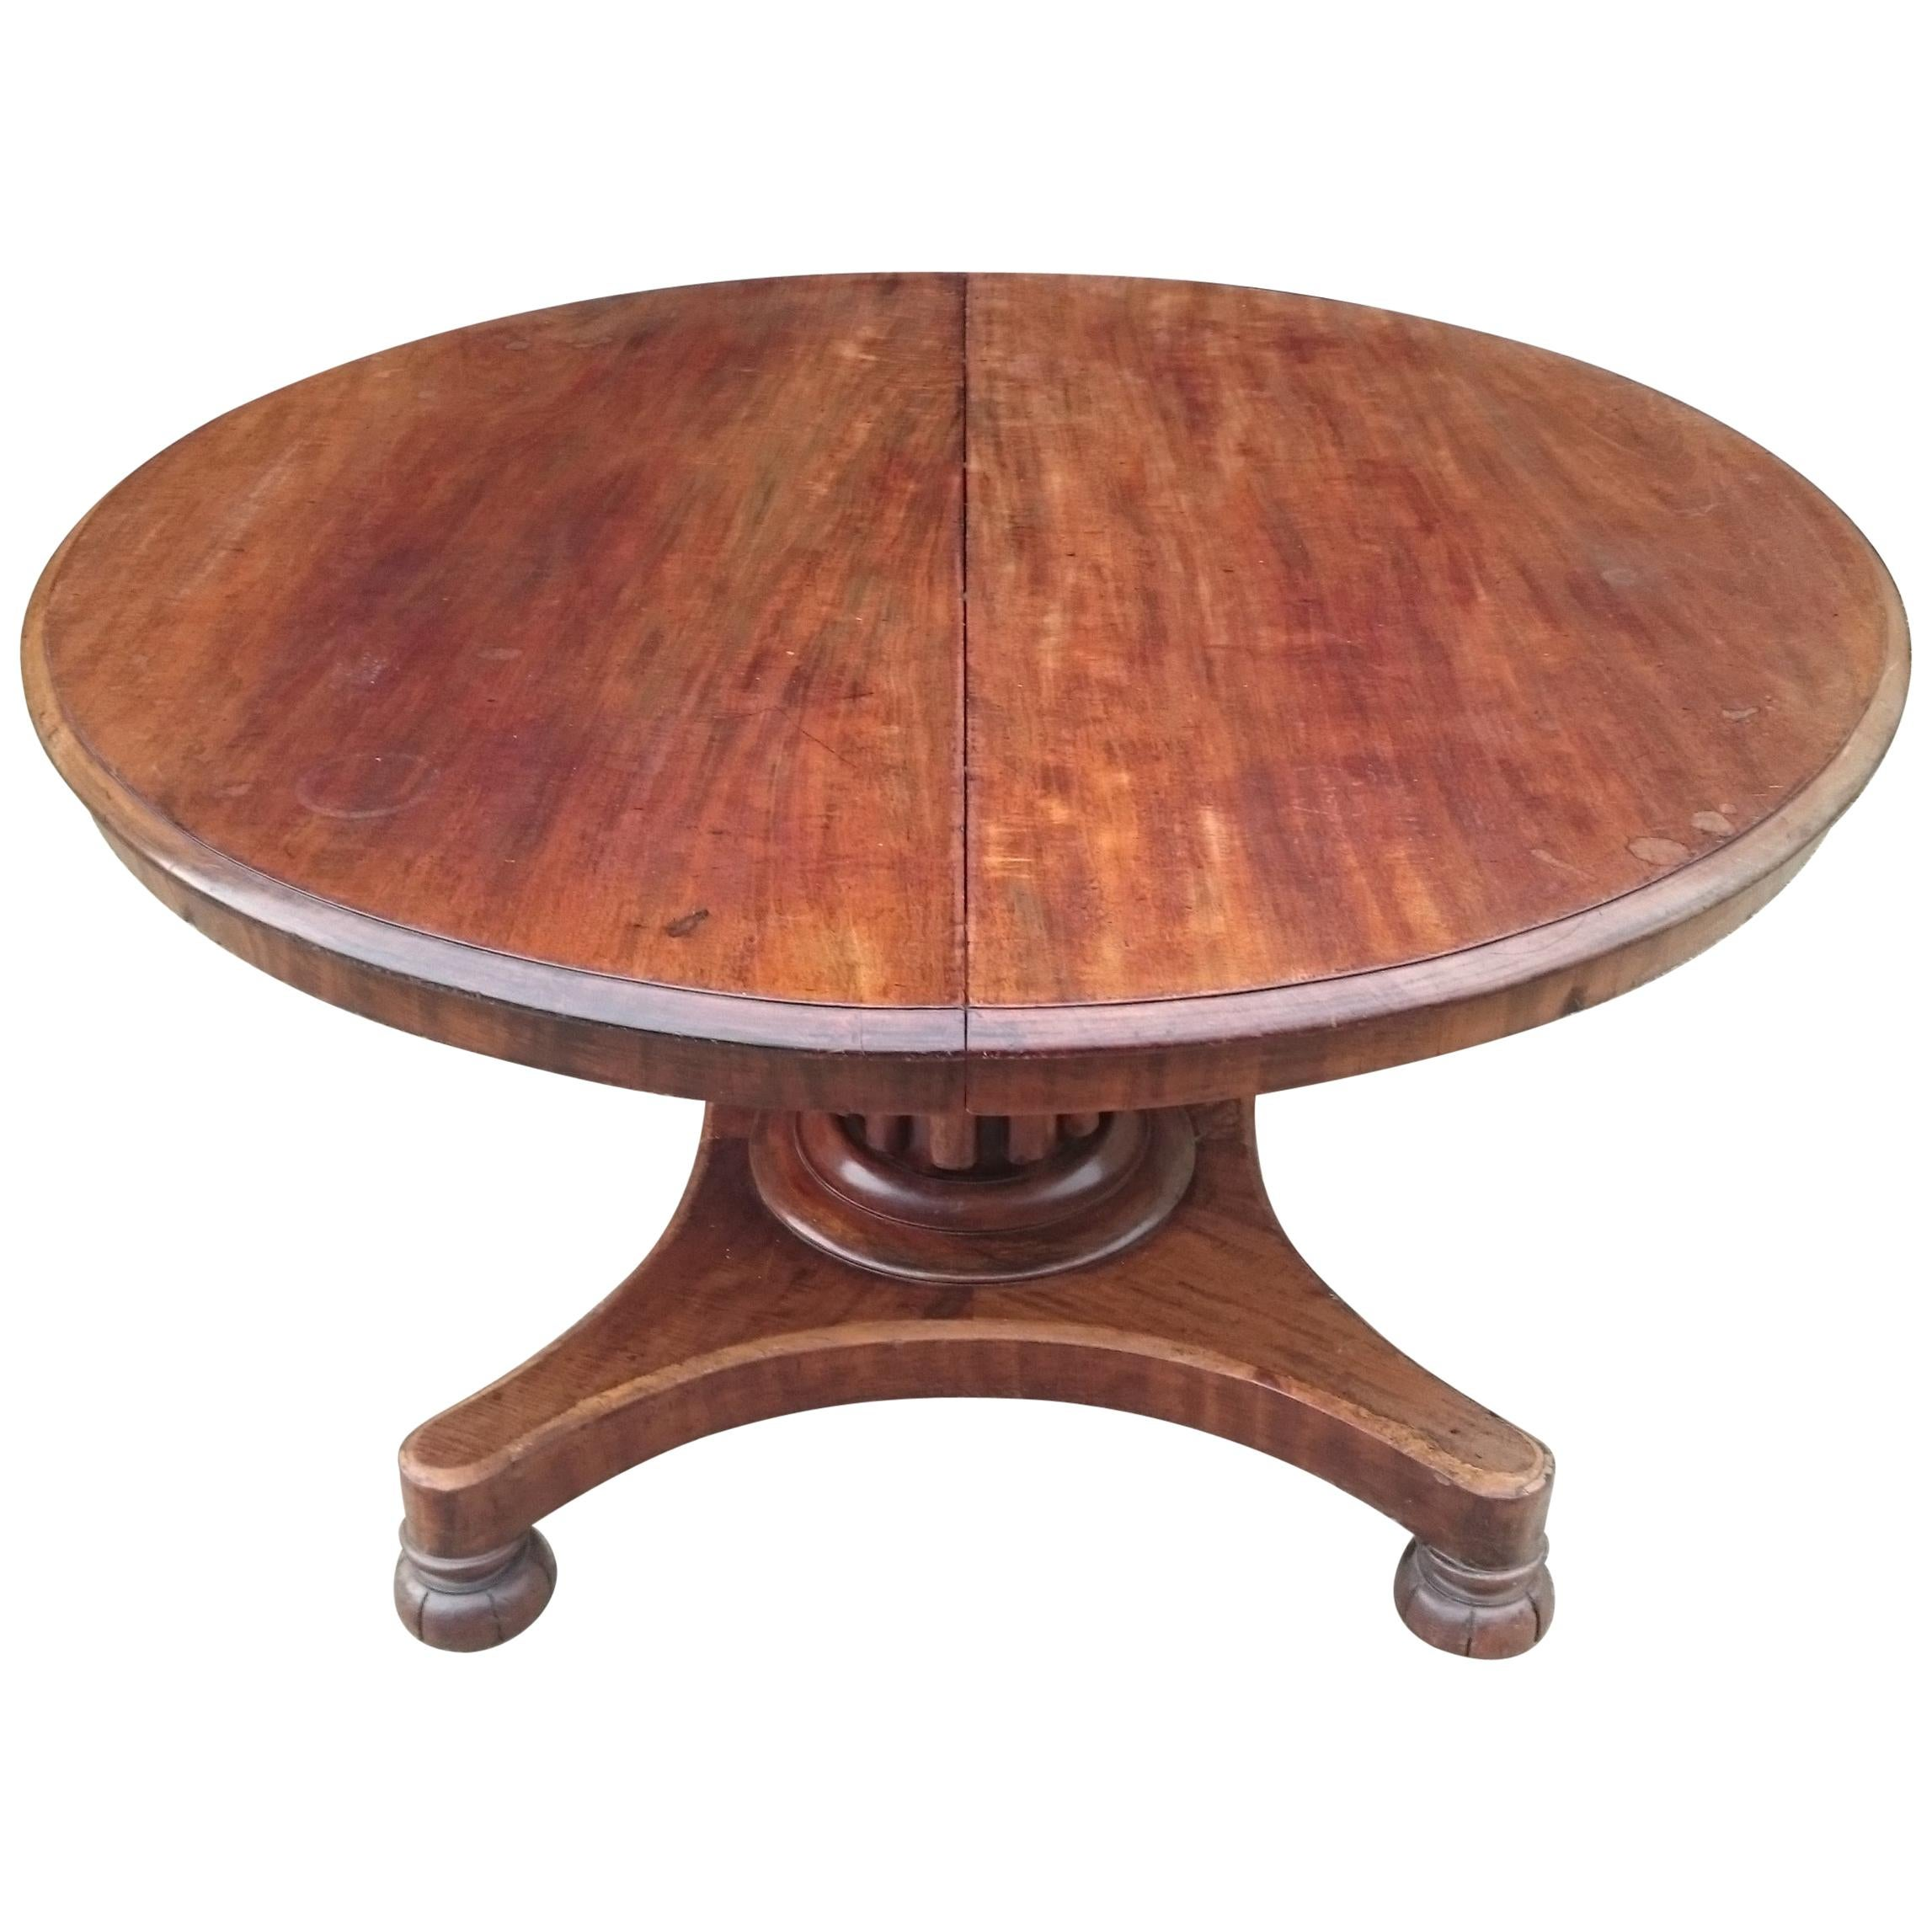 19th Century Mahogany Antique Extending Breakfast Dining Table